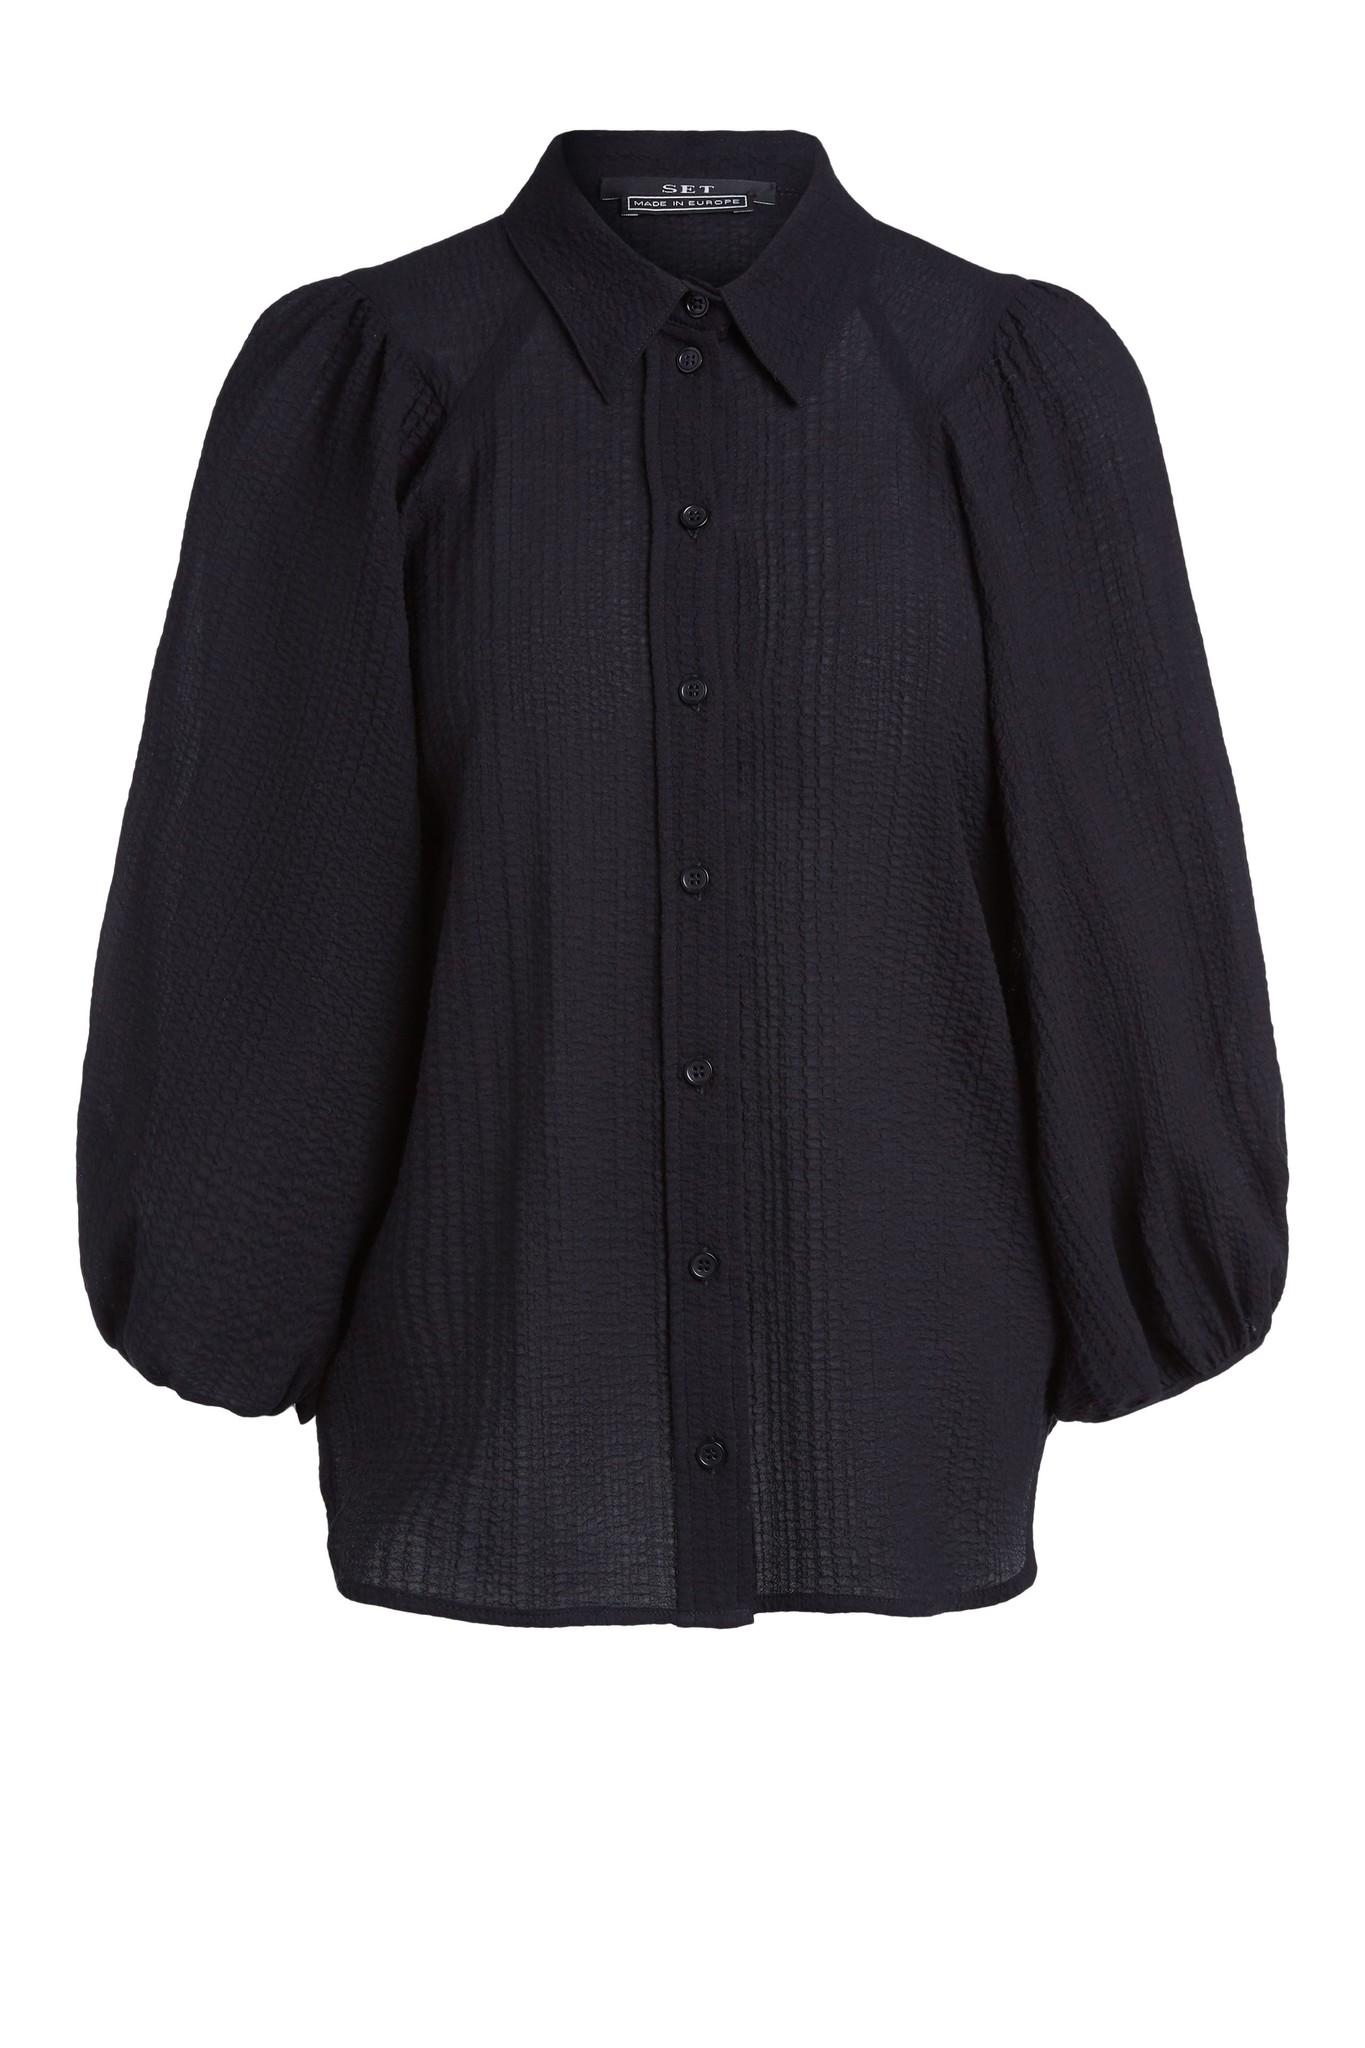 SET blouse 74224 9990-1